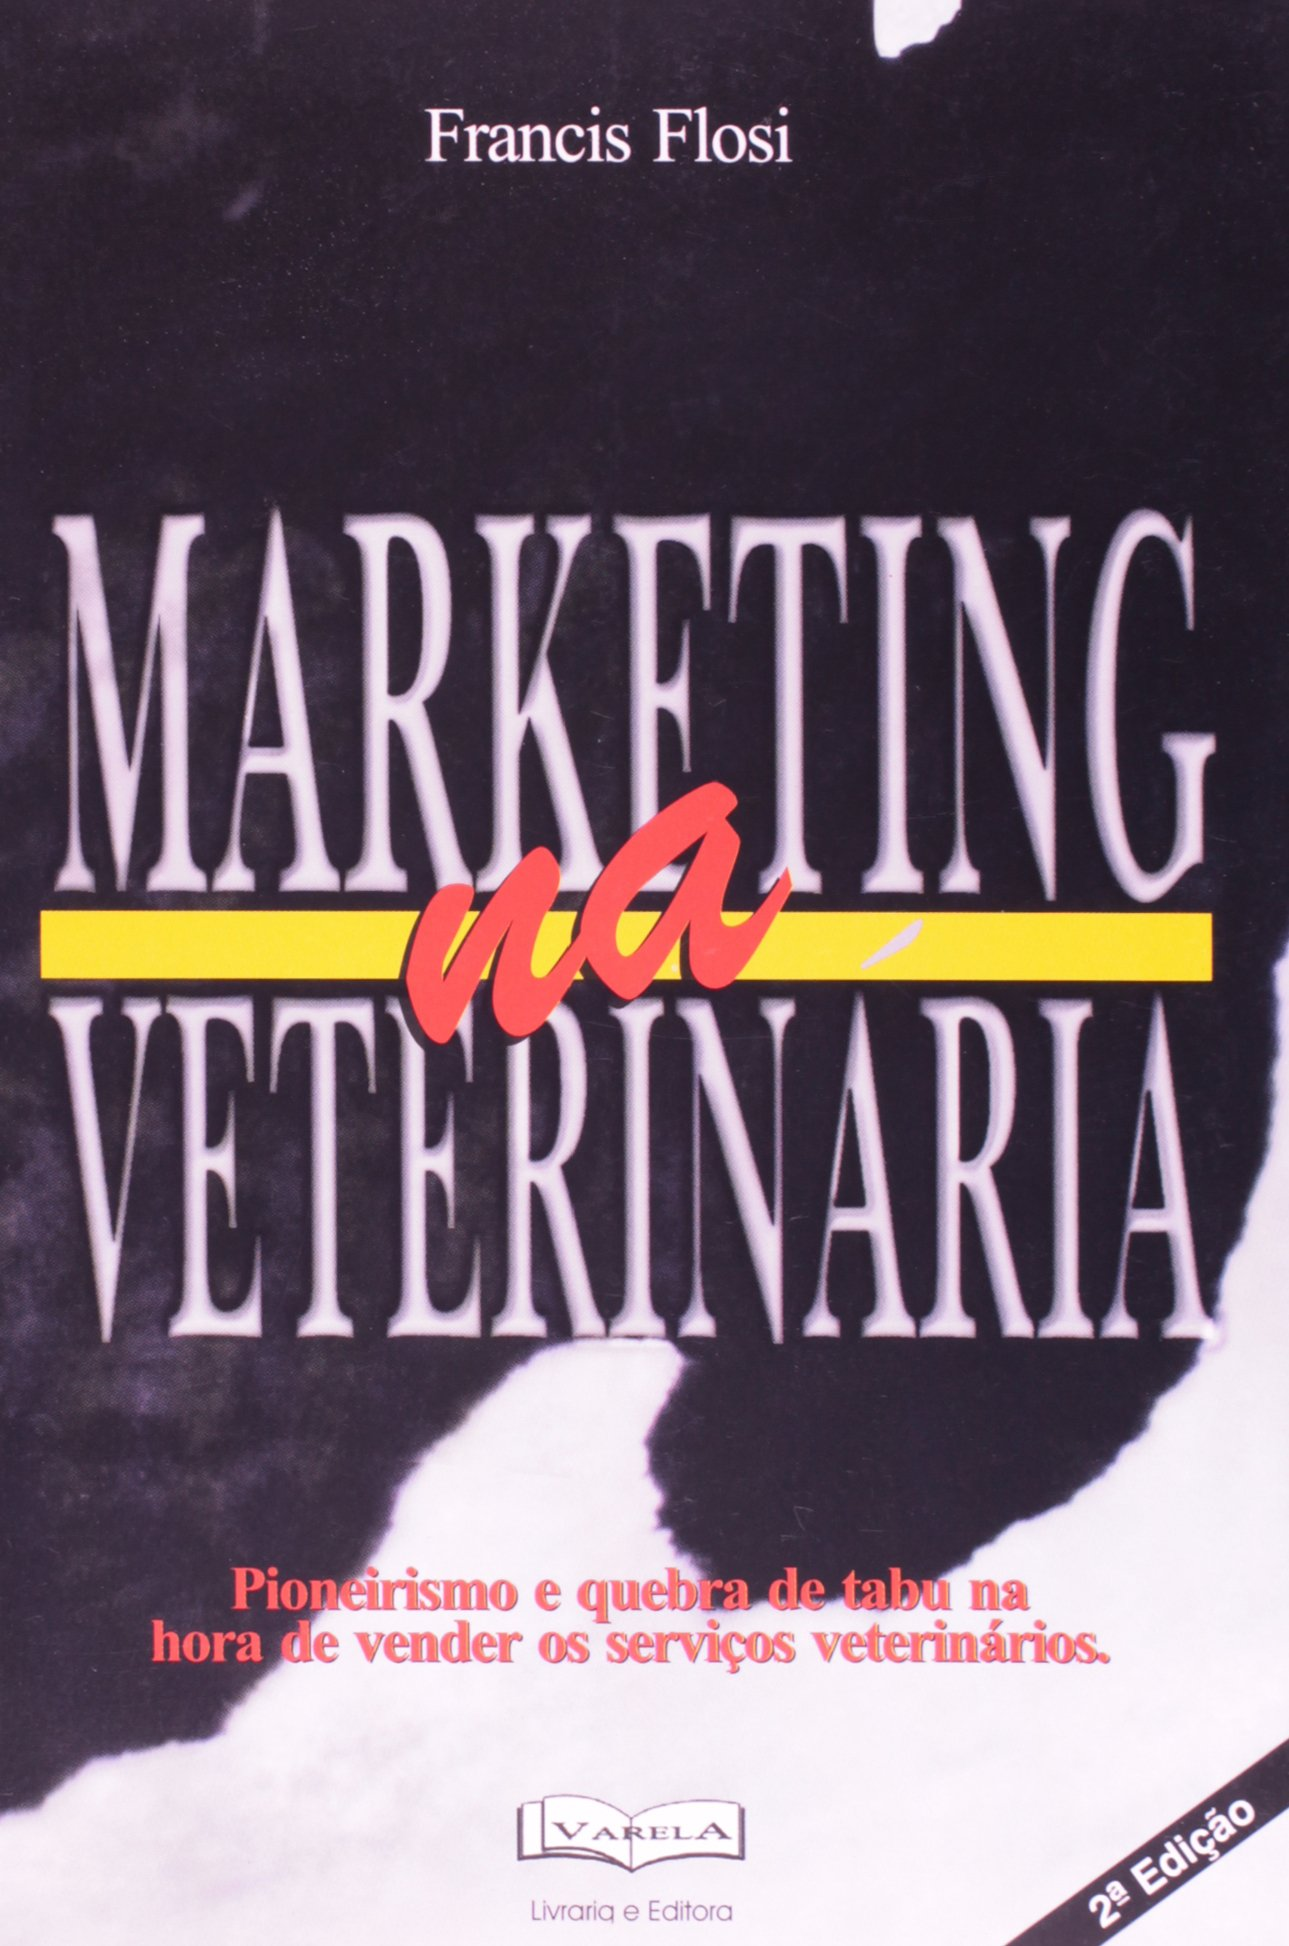 Marketing na Veterinária 2001 (Em Portuguese do Brasil) PDF